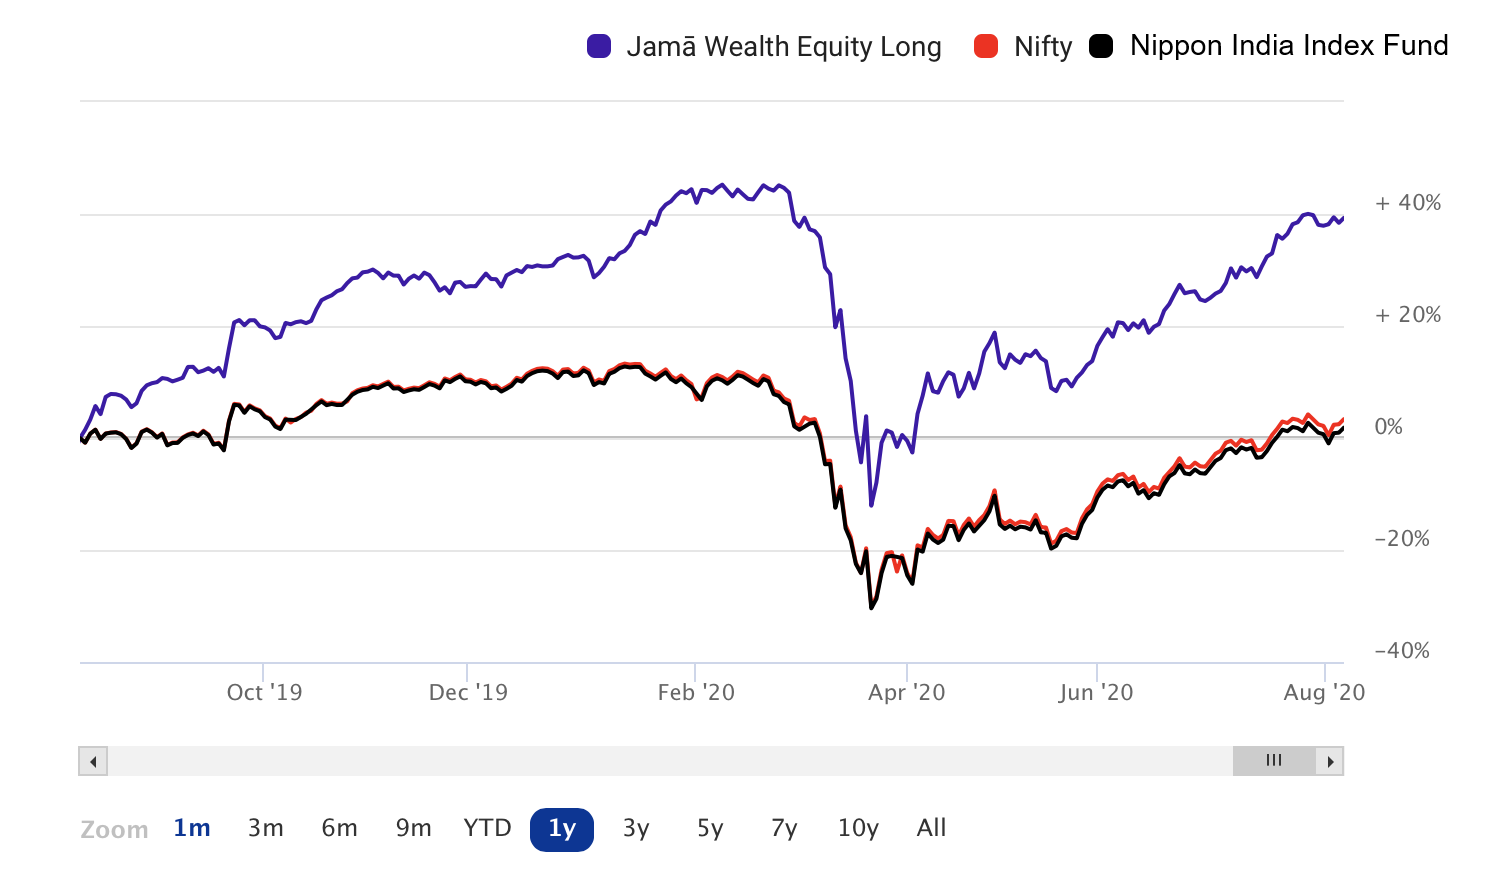 Jama Wealth vs Nippon India Index Fund